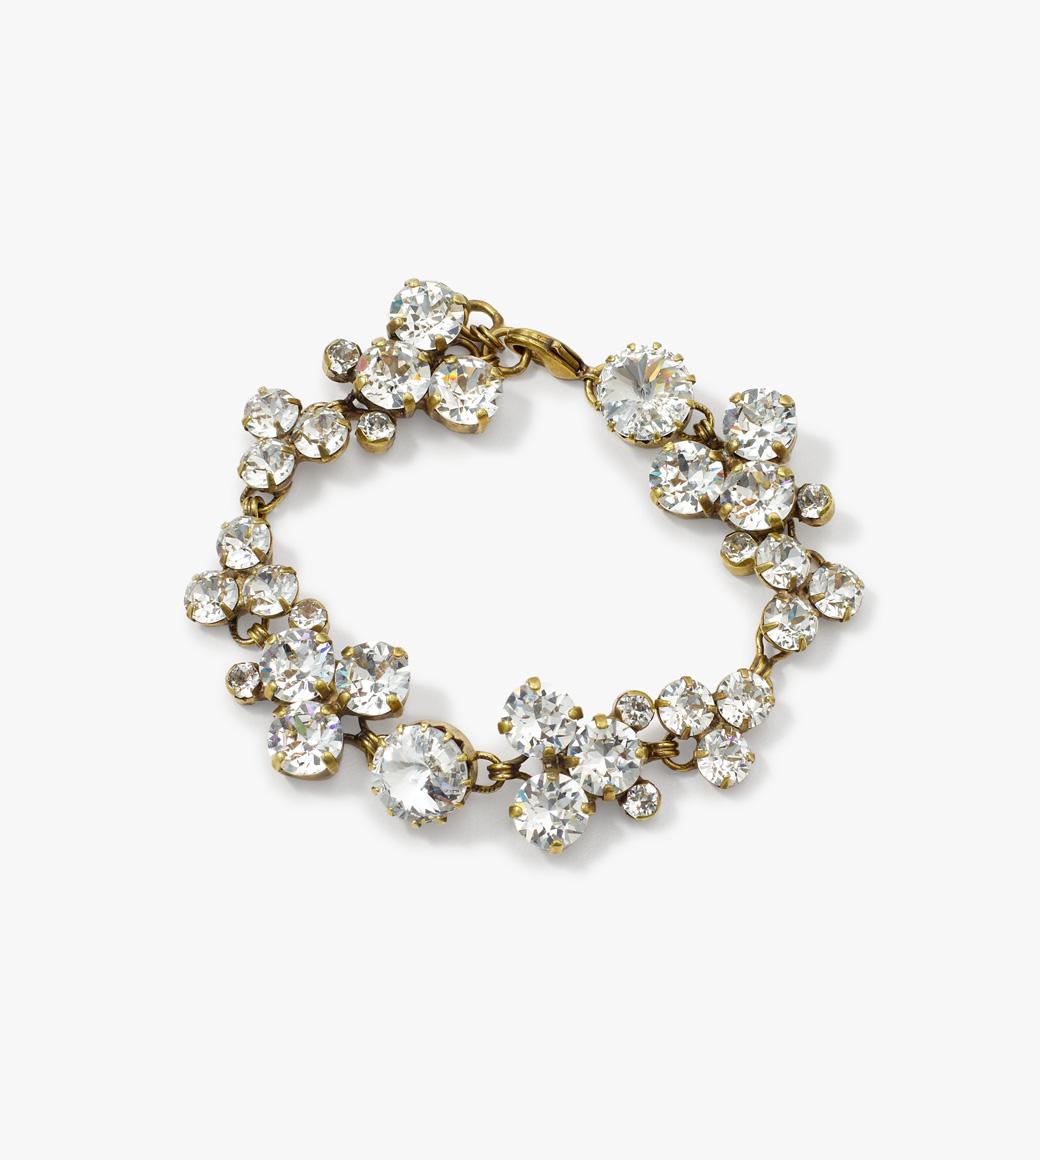 fashion jewelry ornate bracelets pqhdyna